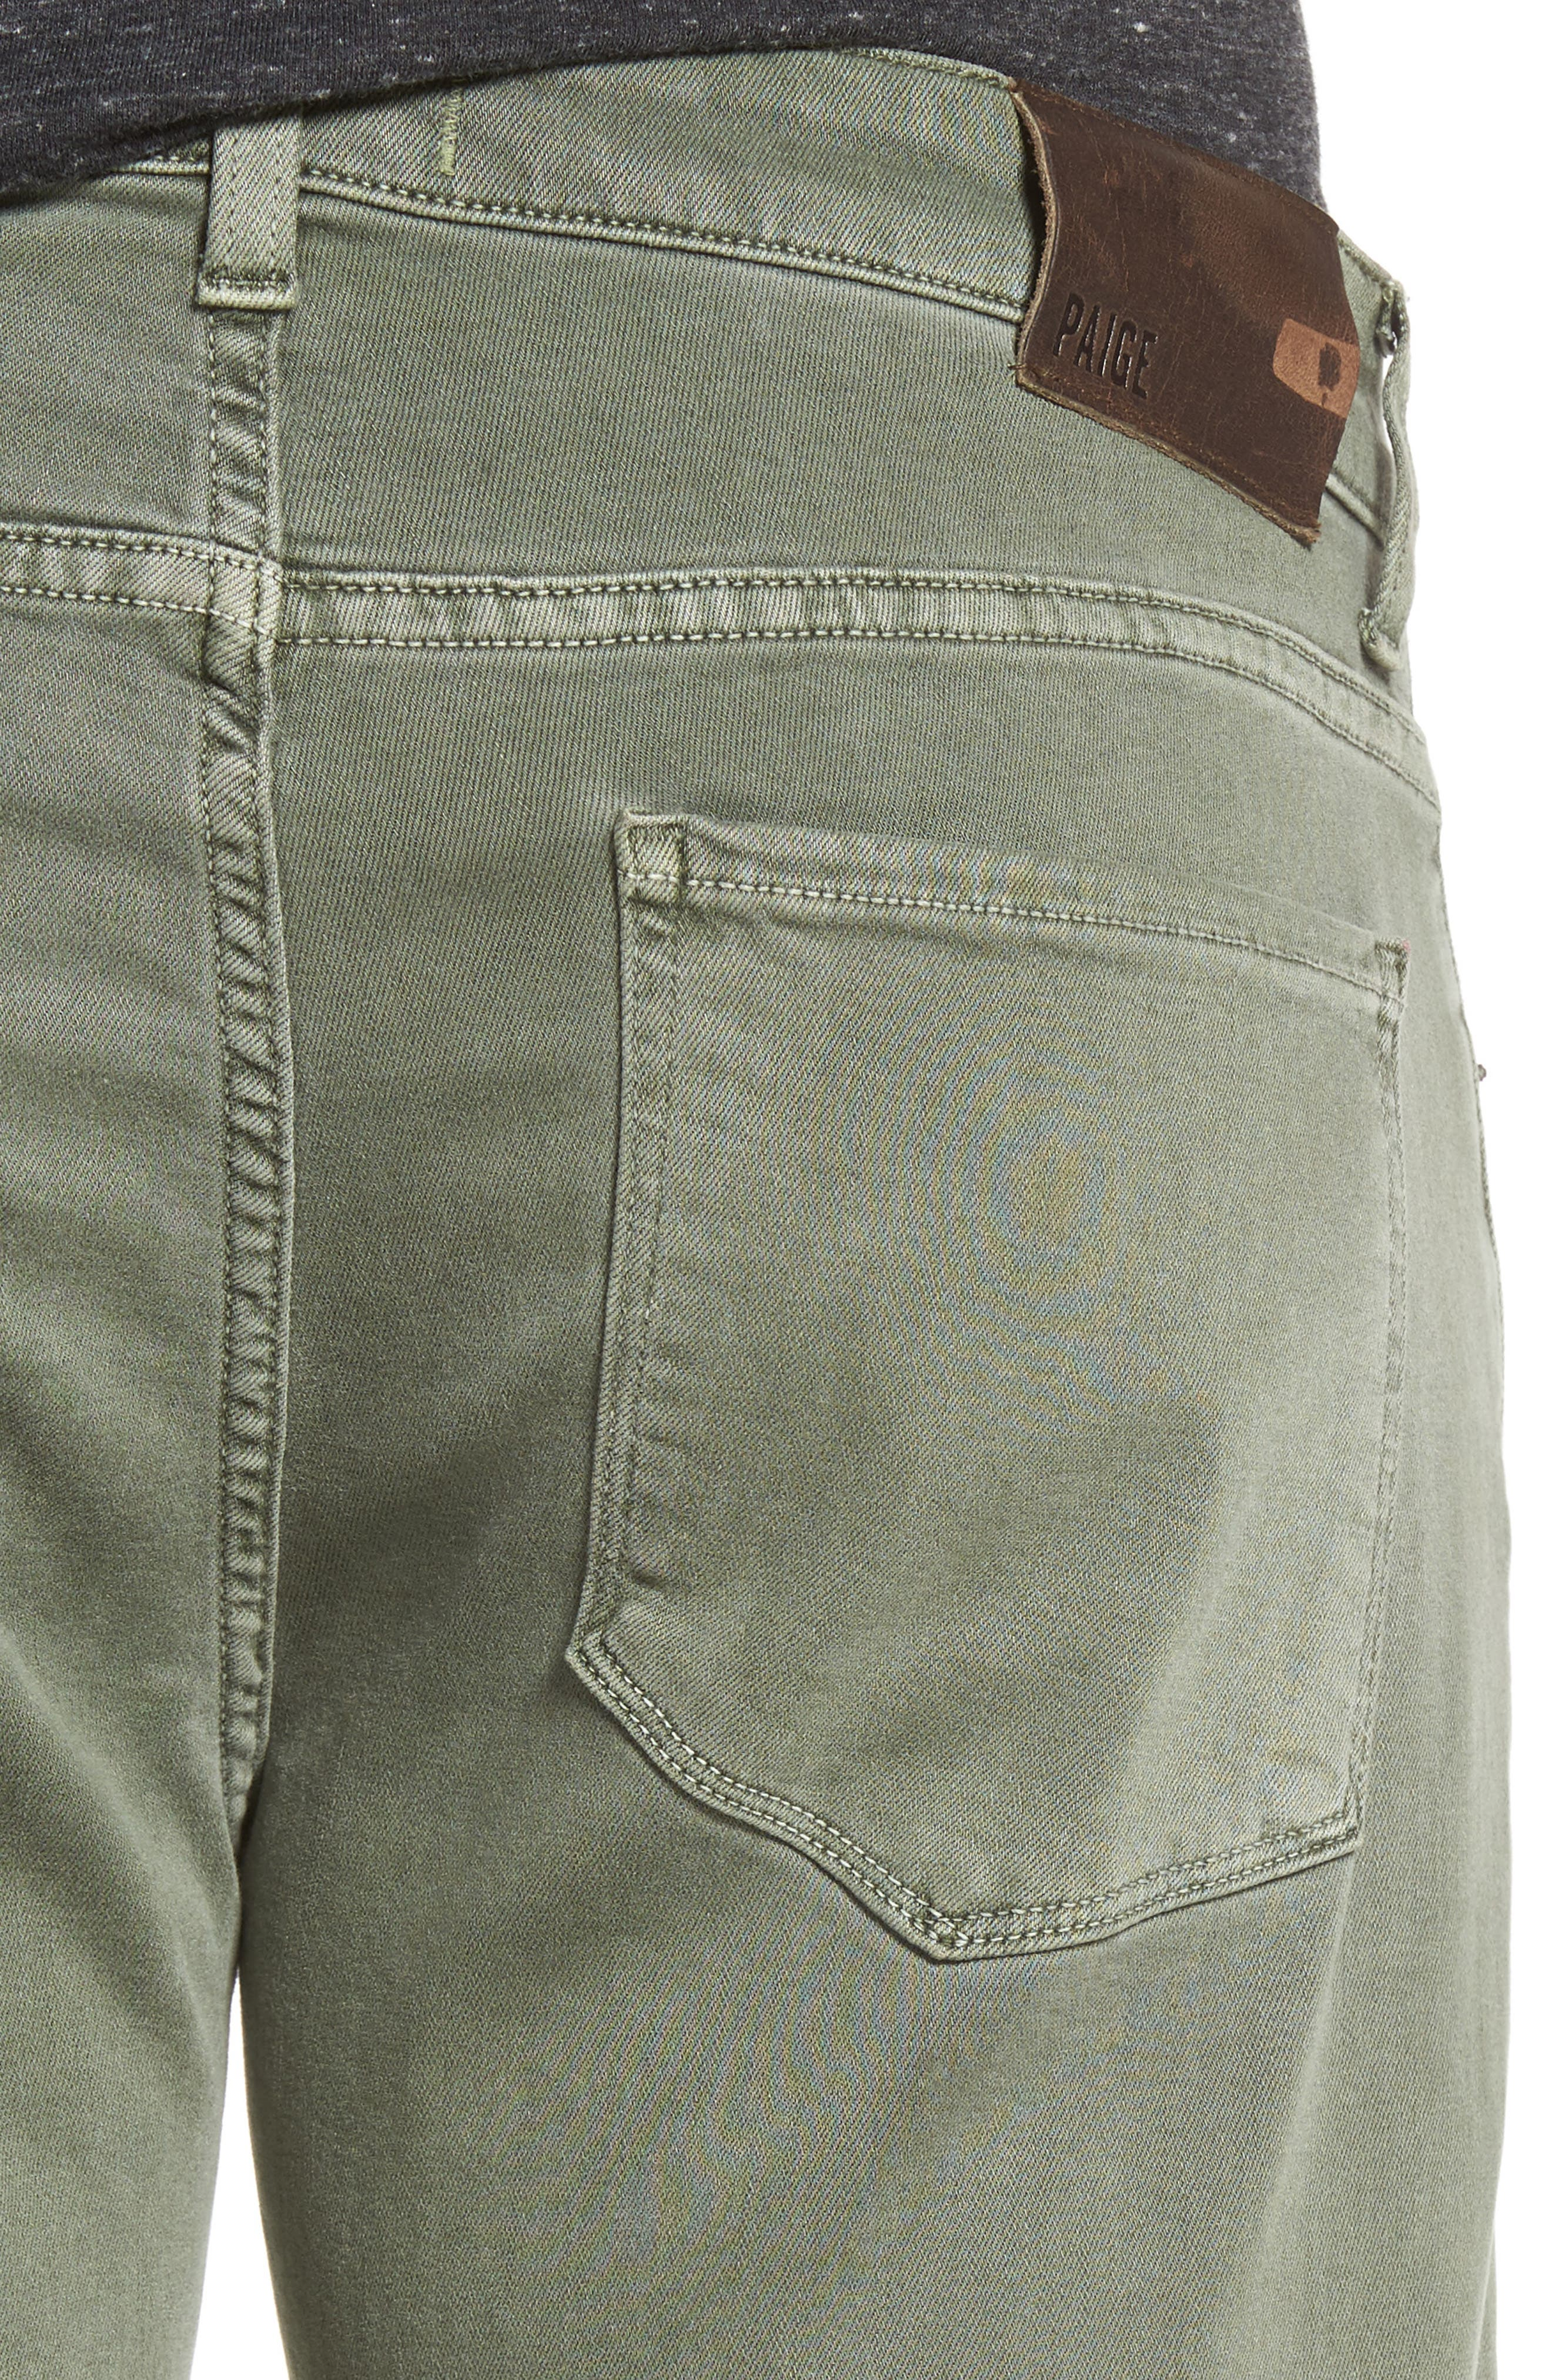 Transcend - Lennox Slim Fit Jeans,                             Alternate thumbnail 4, color,                             300